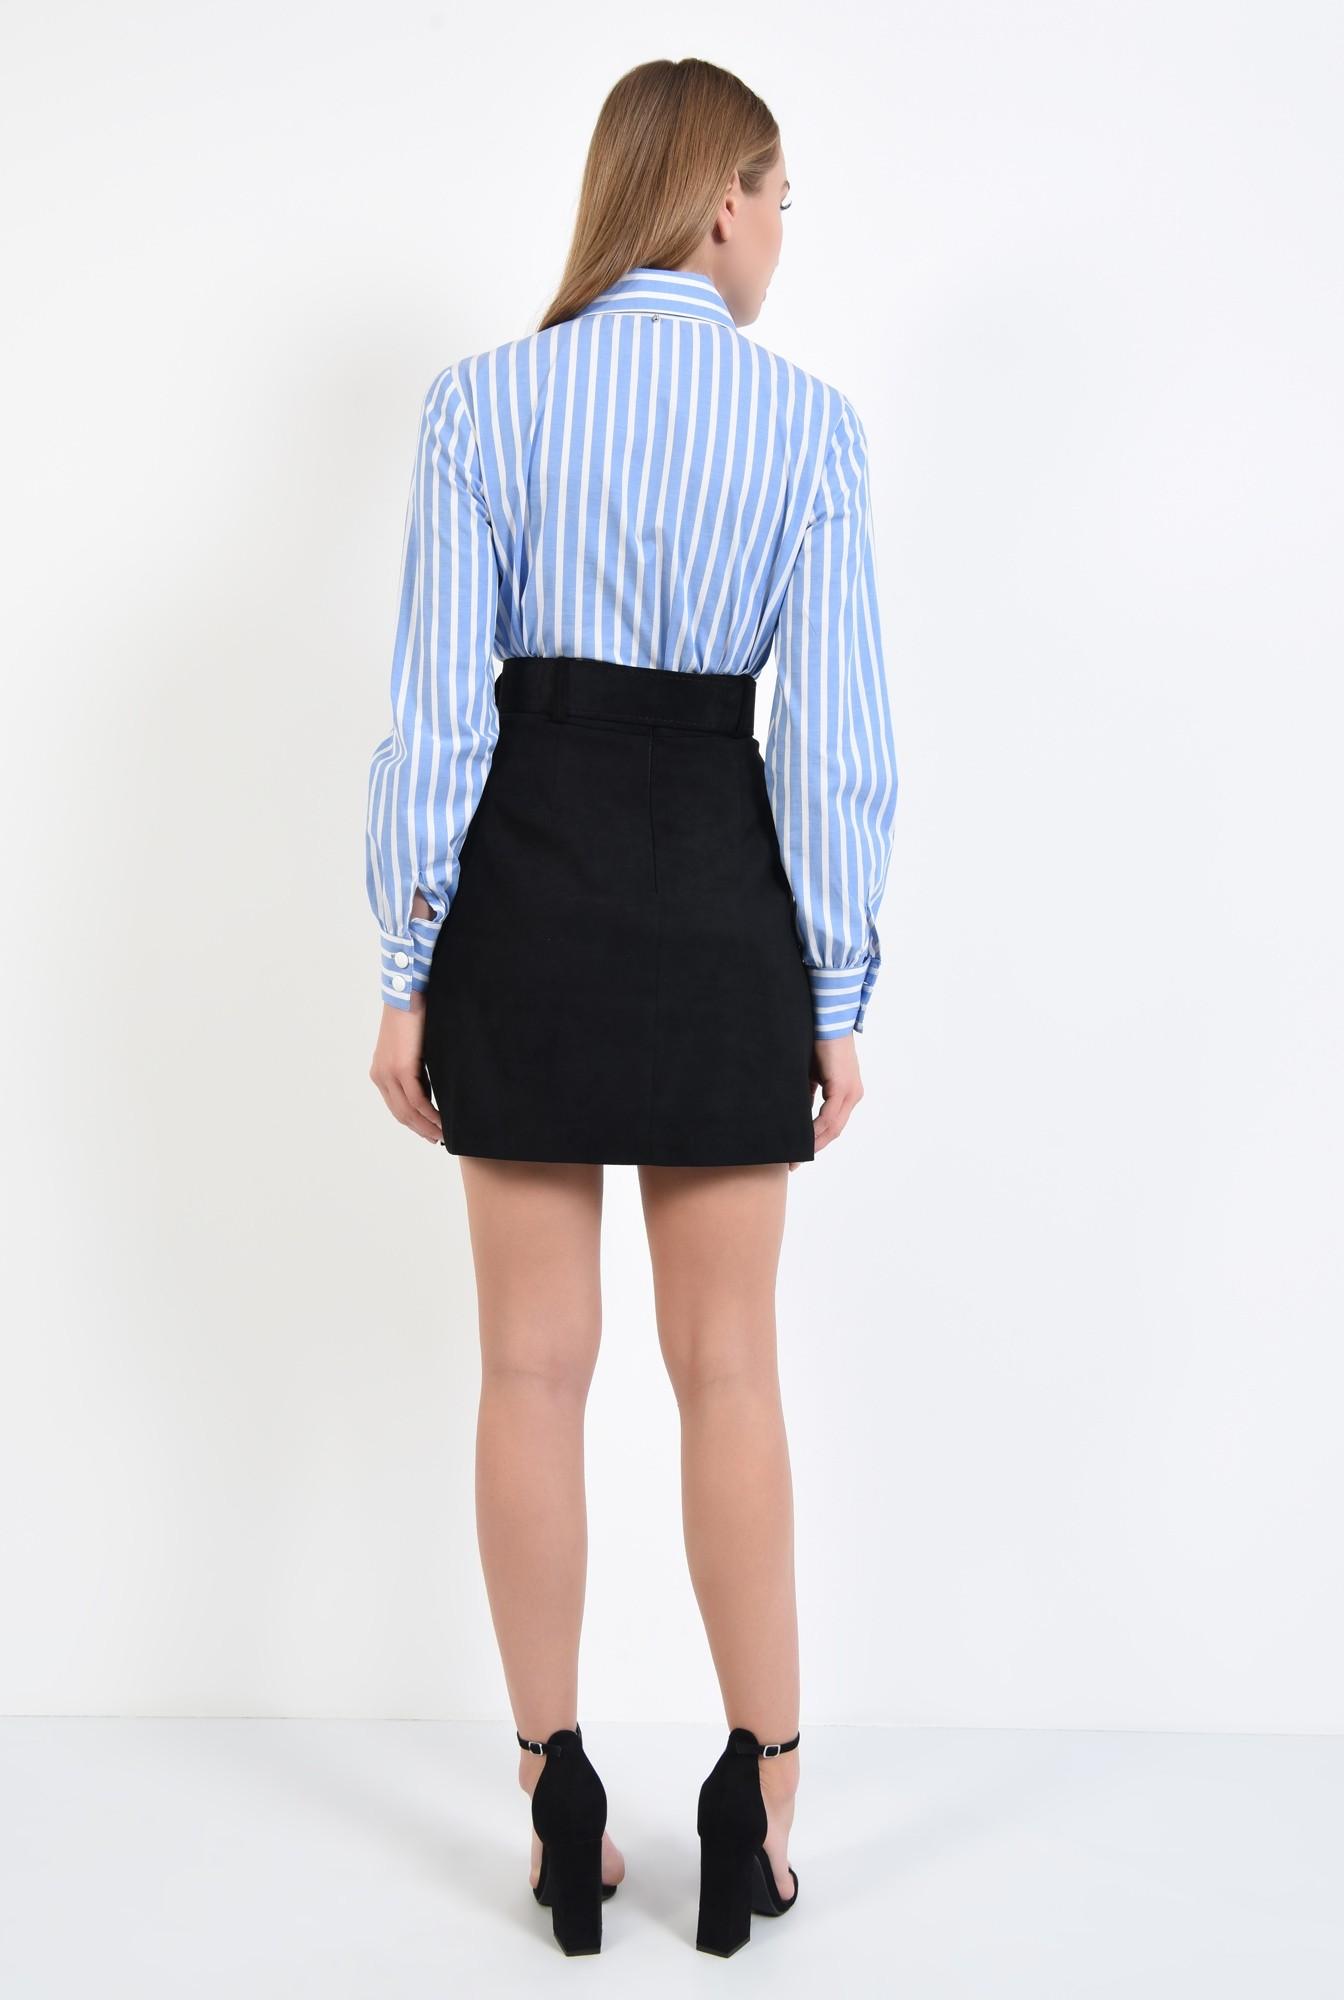 1 - fusta casual, scurta, croi evazat scurt, neagra